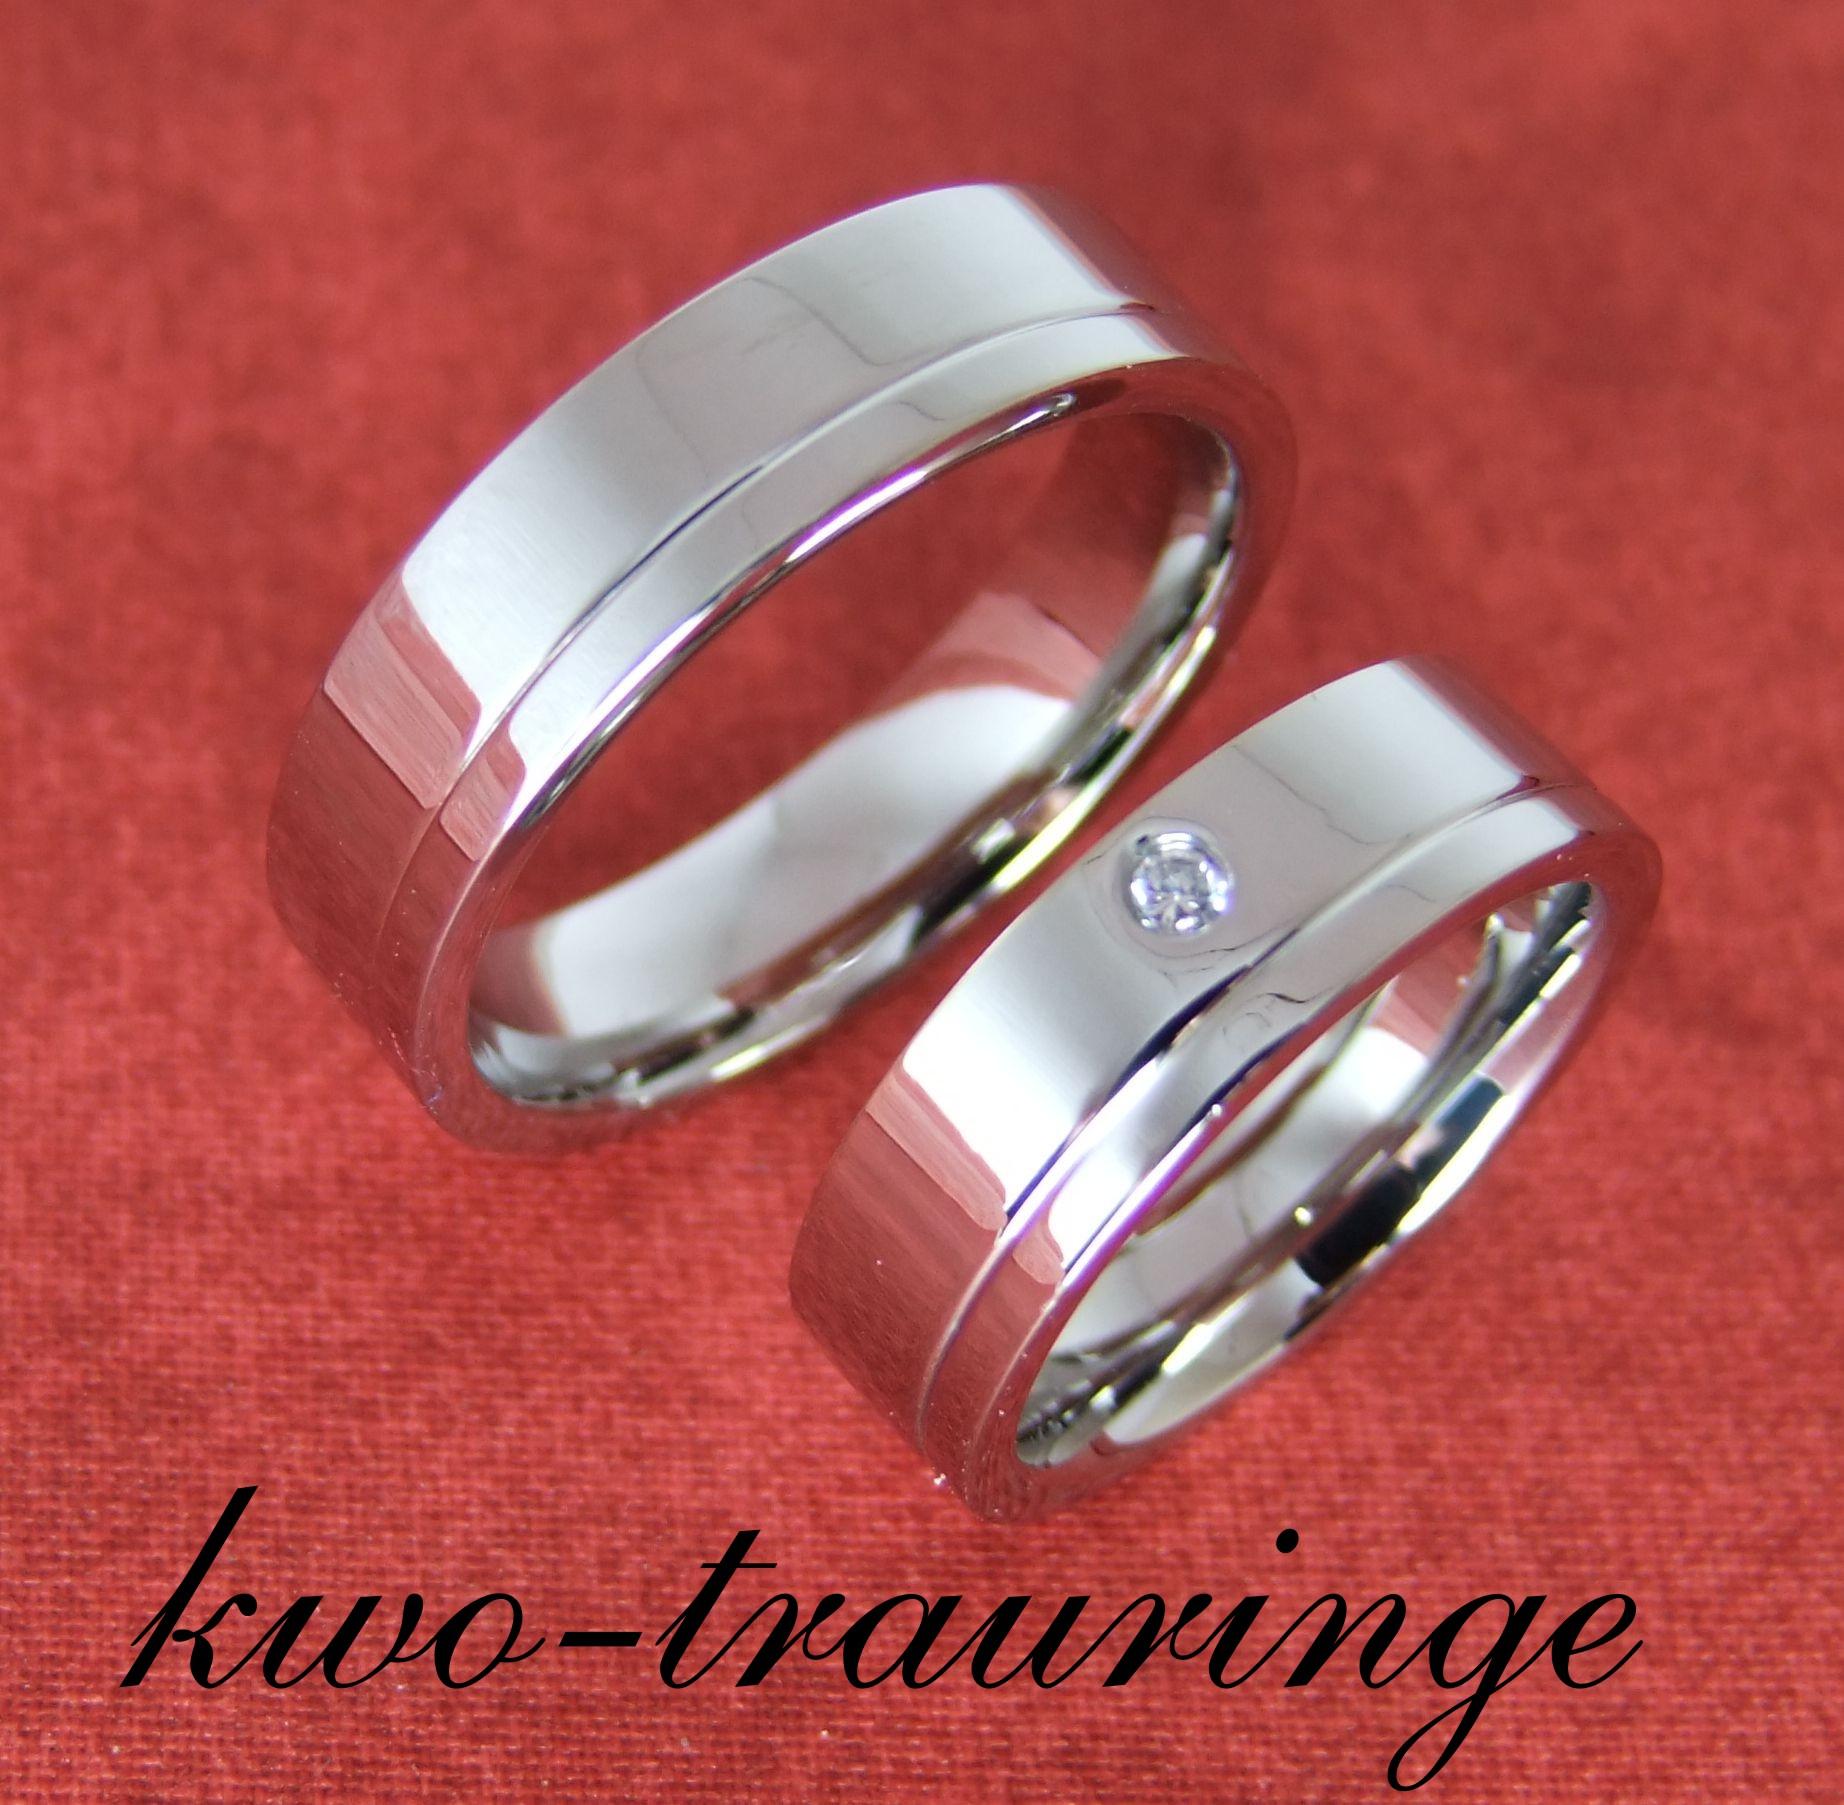 ... Trauringe Paarringe Hochzeitsringe Eheringe 6 mm & Gravur  eBay